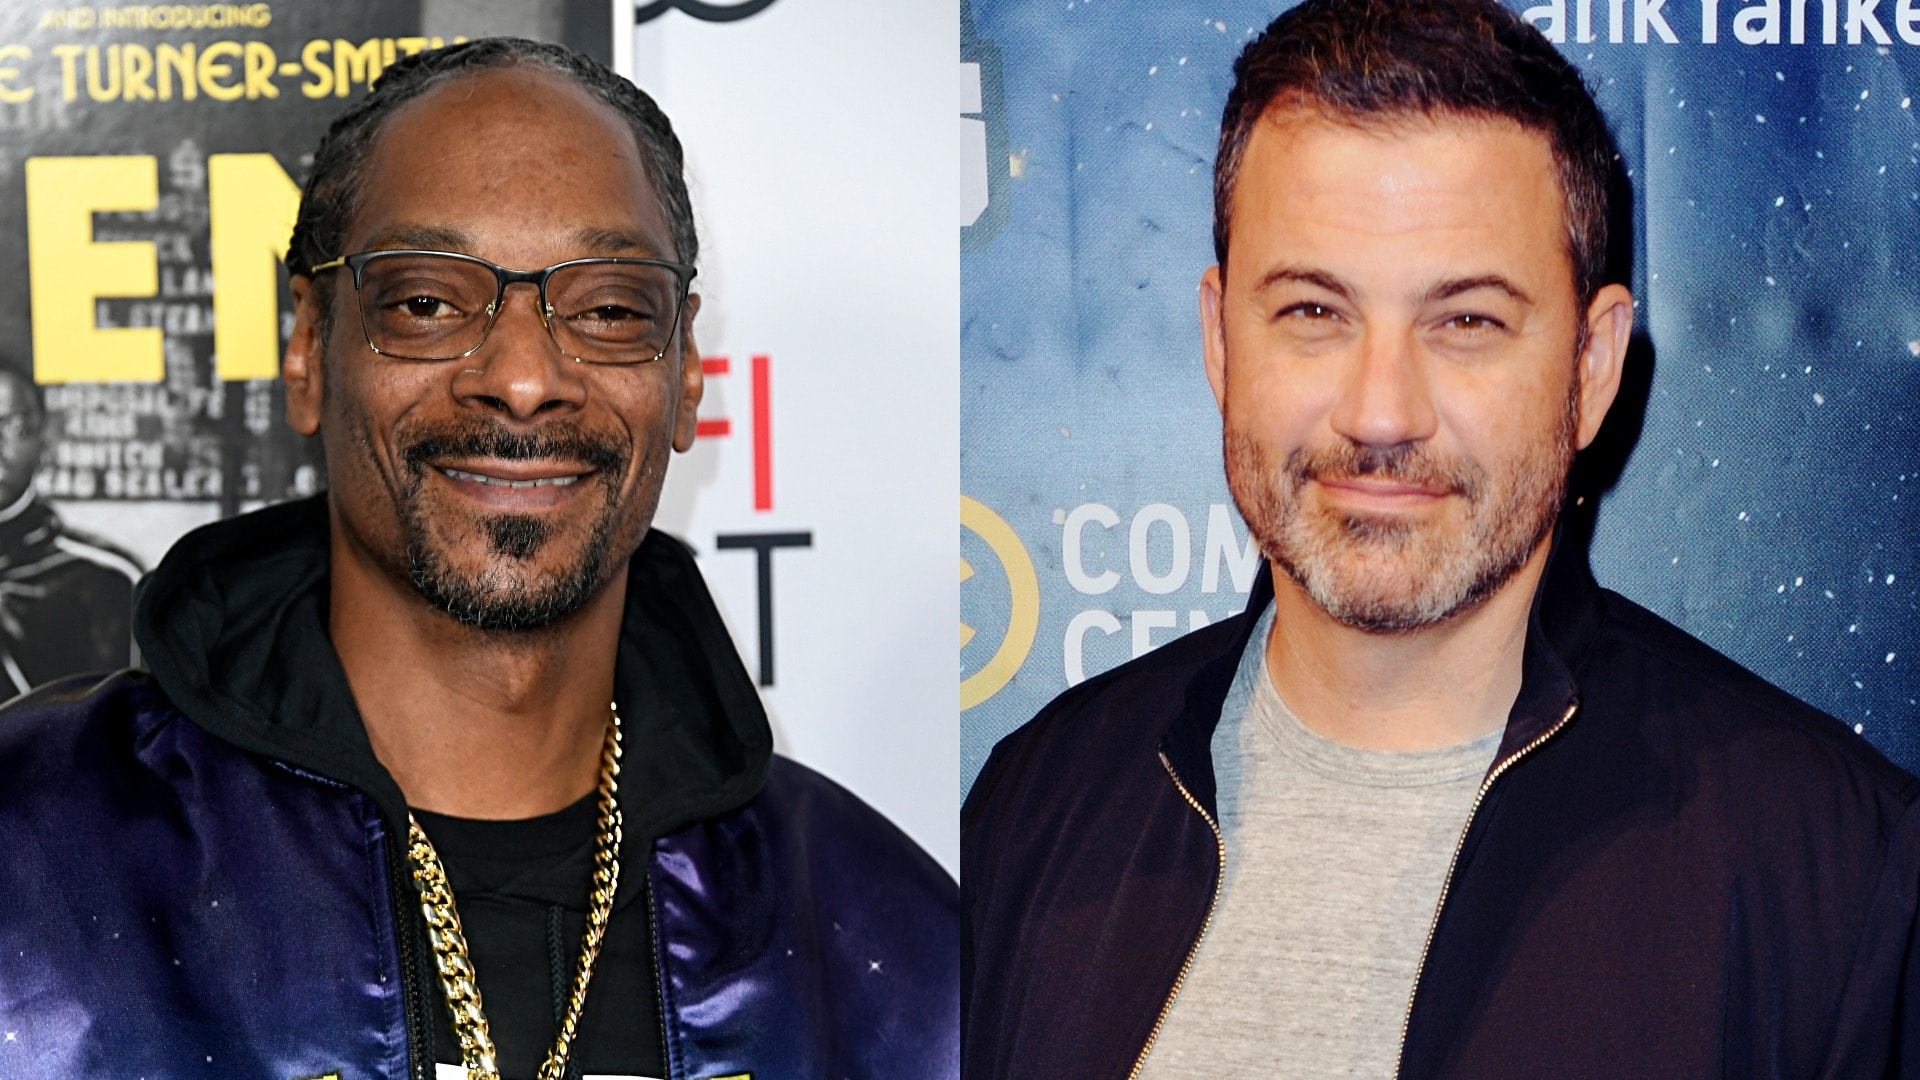 Audio of Jimmy Kimmel using 'N' word while imitating Snoop surfaces online - TheGrio